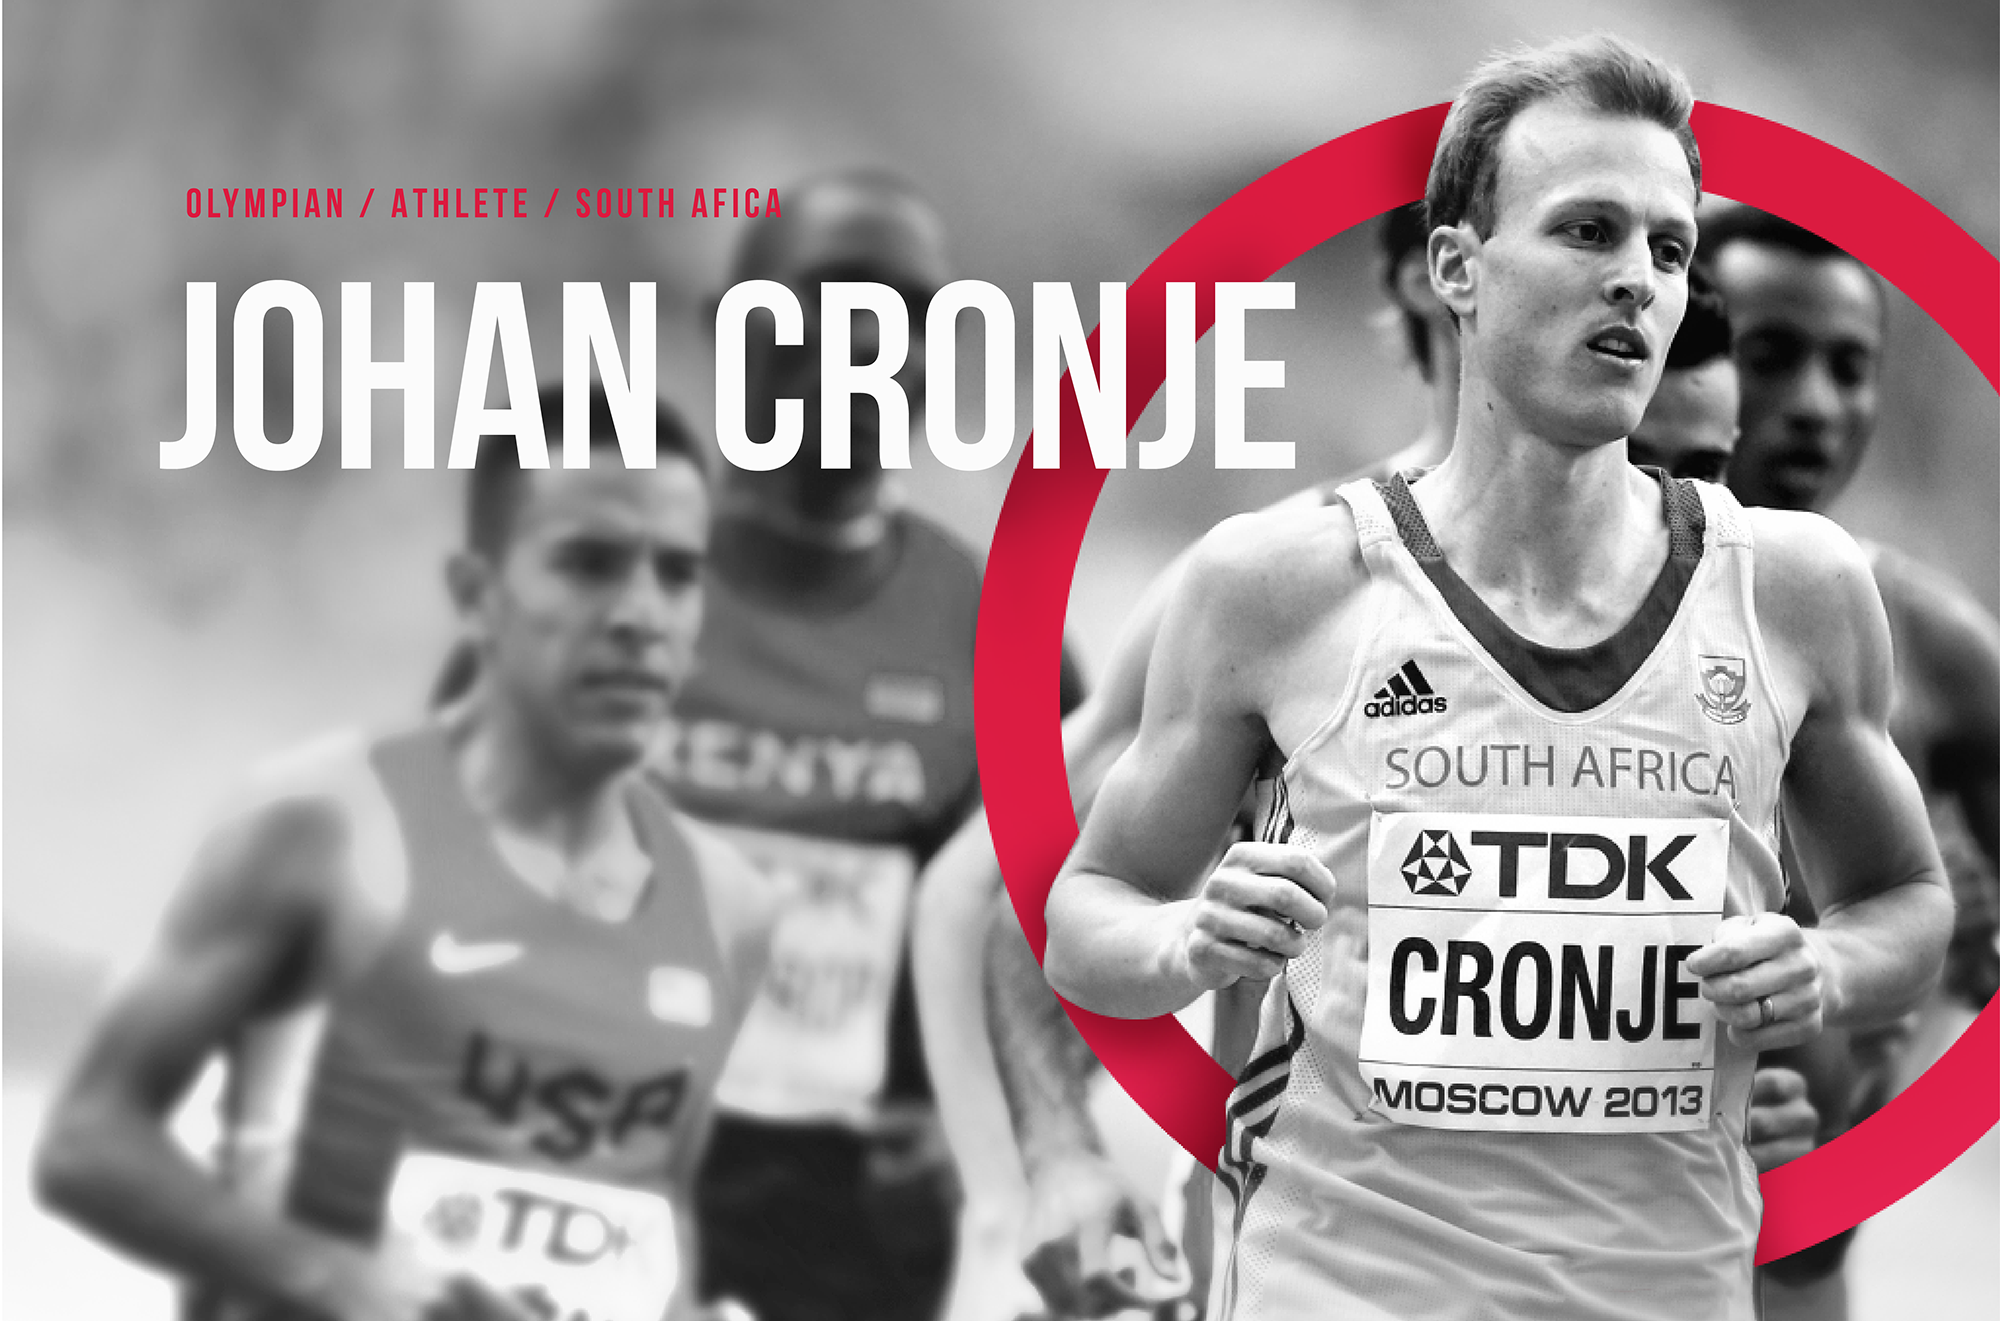 Meet Johan Cronje • South African Athlete • Bright Sparks